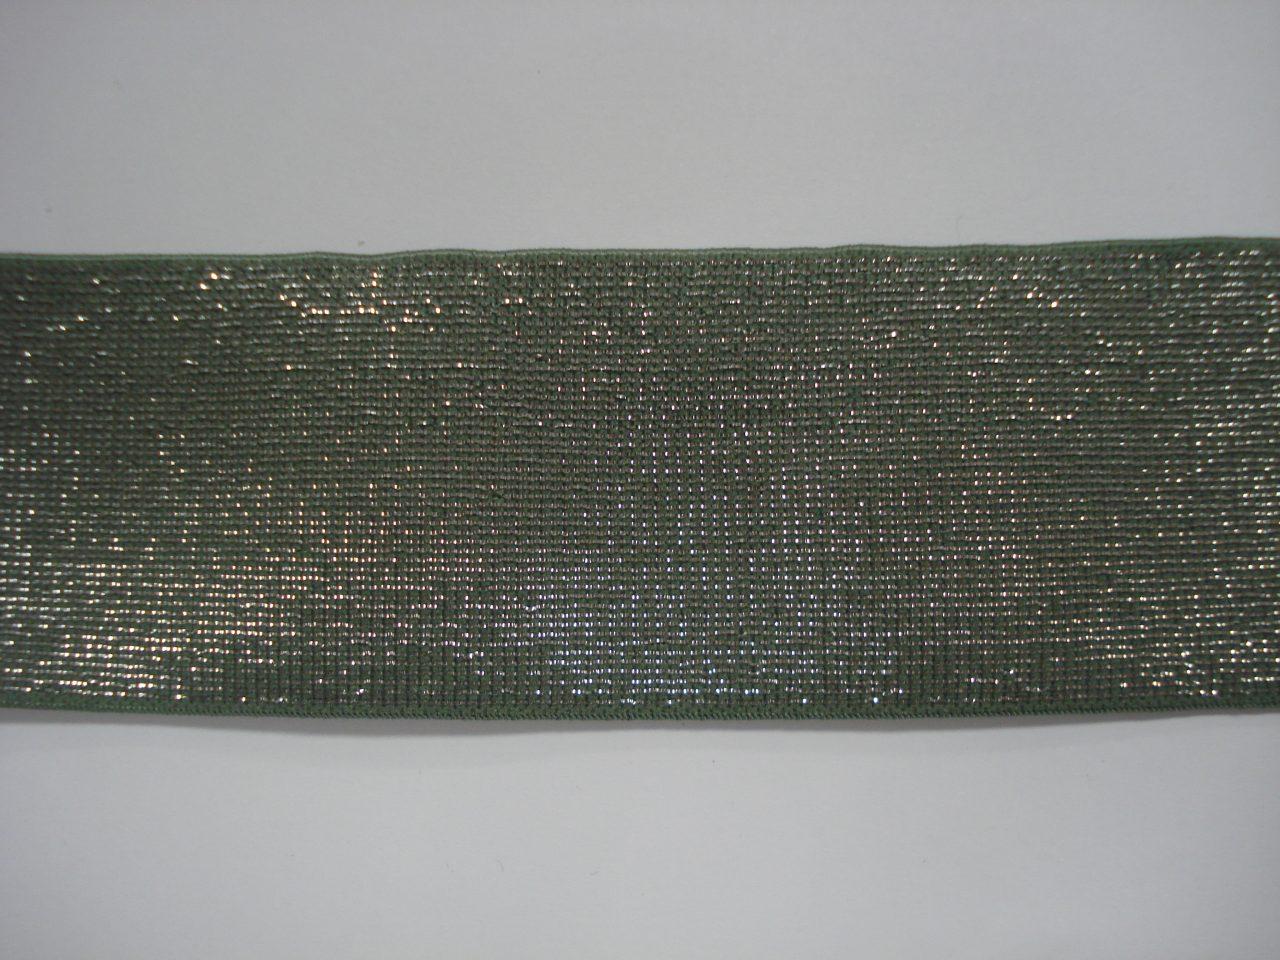 Glitter Elastiek 40mm oudgroen/zilver €3,50 p/m